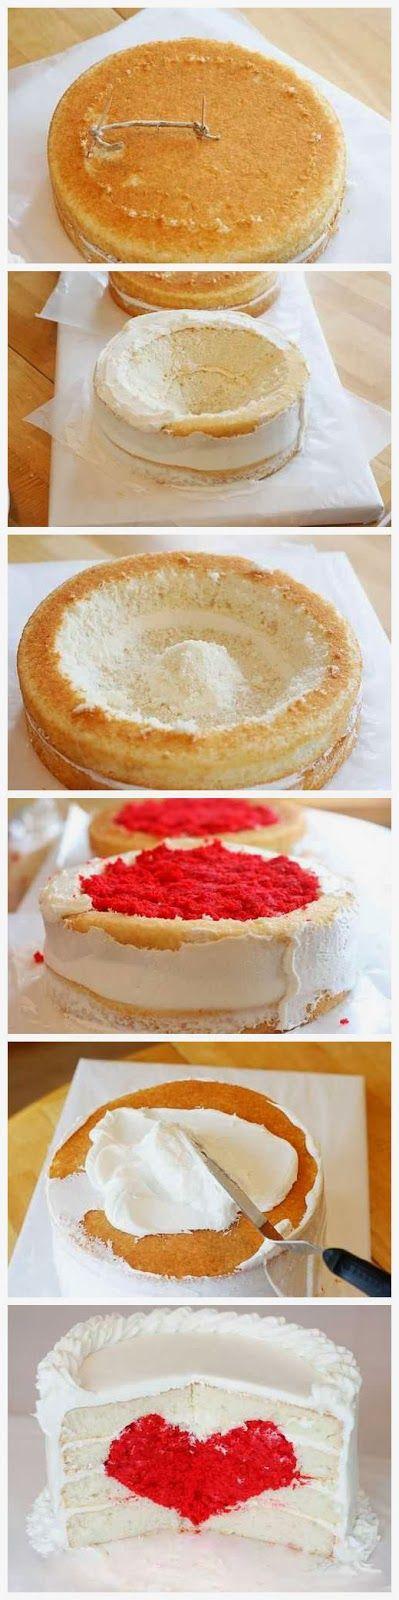 Heart Cake Tutorial - Latest Food